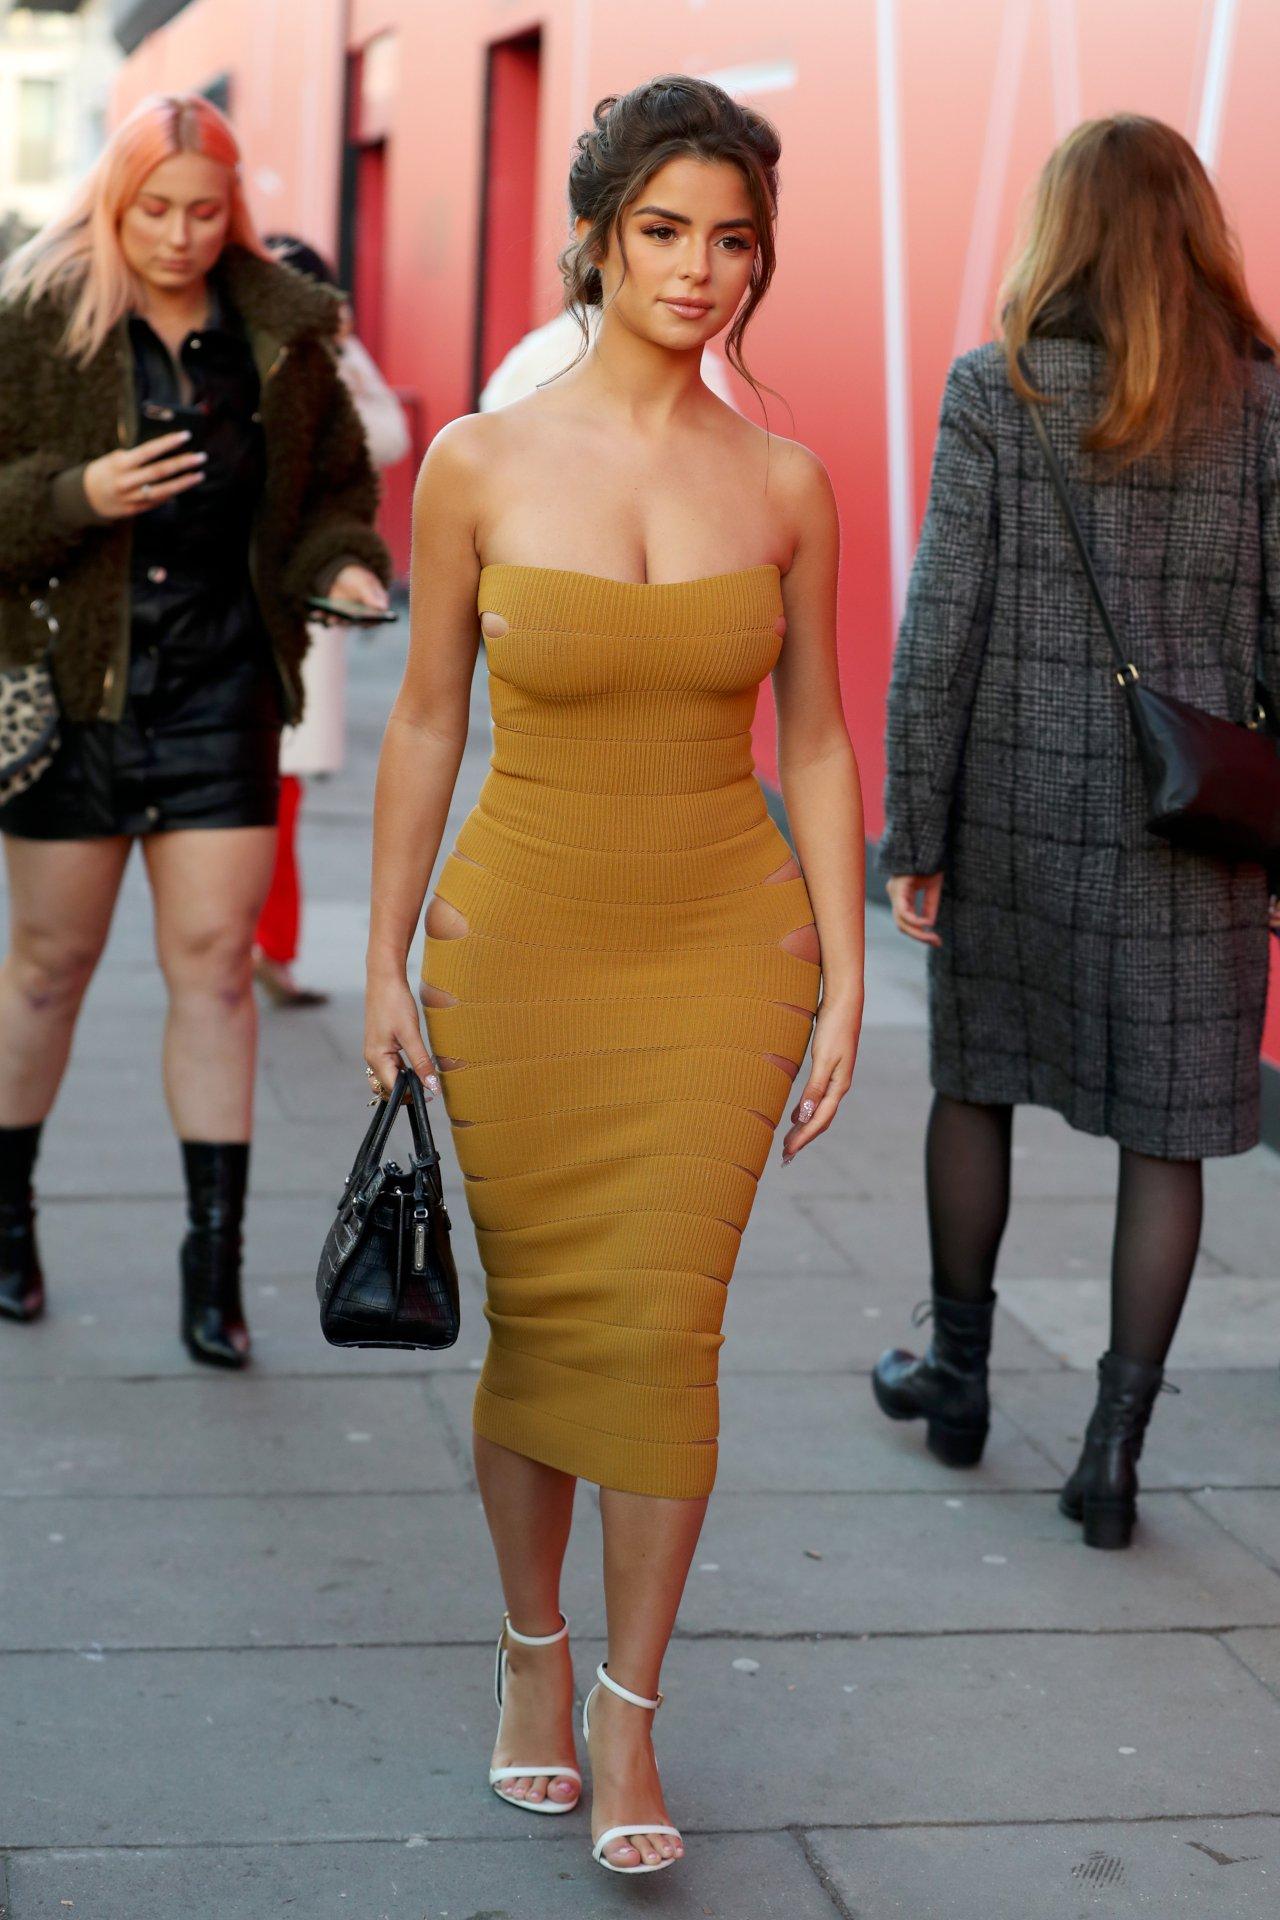 Demi Rose Mawby Hot Body